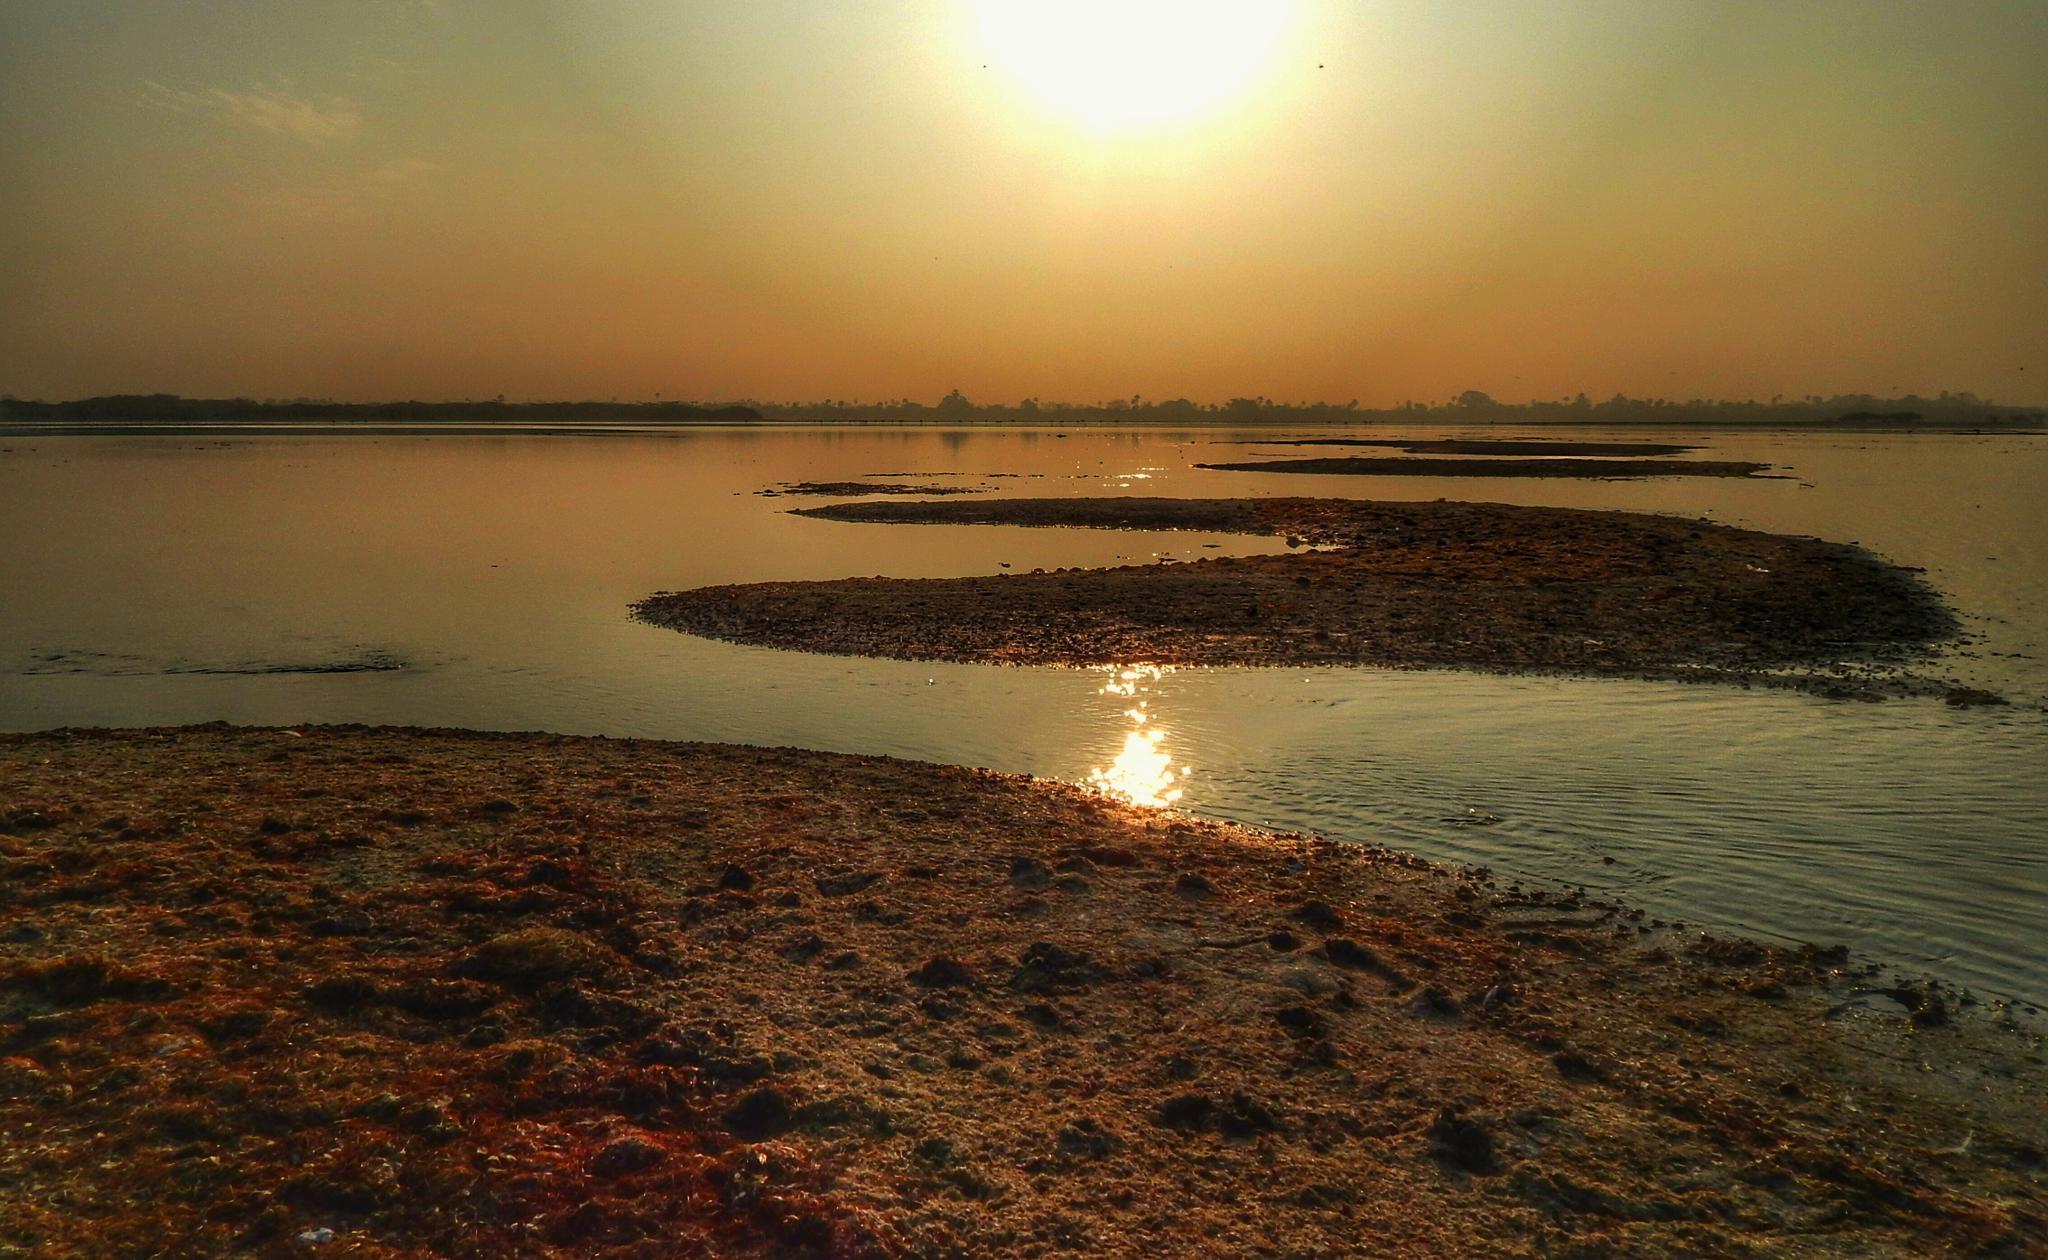 lake by Aritra ghosh